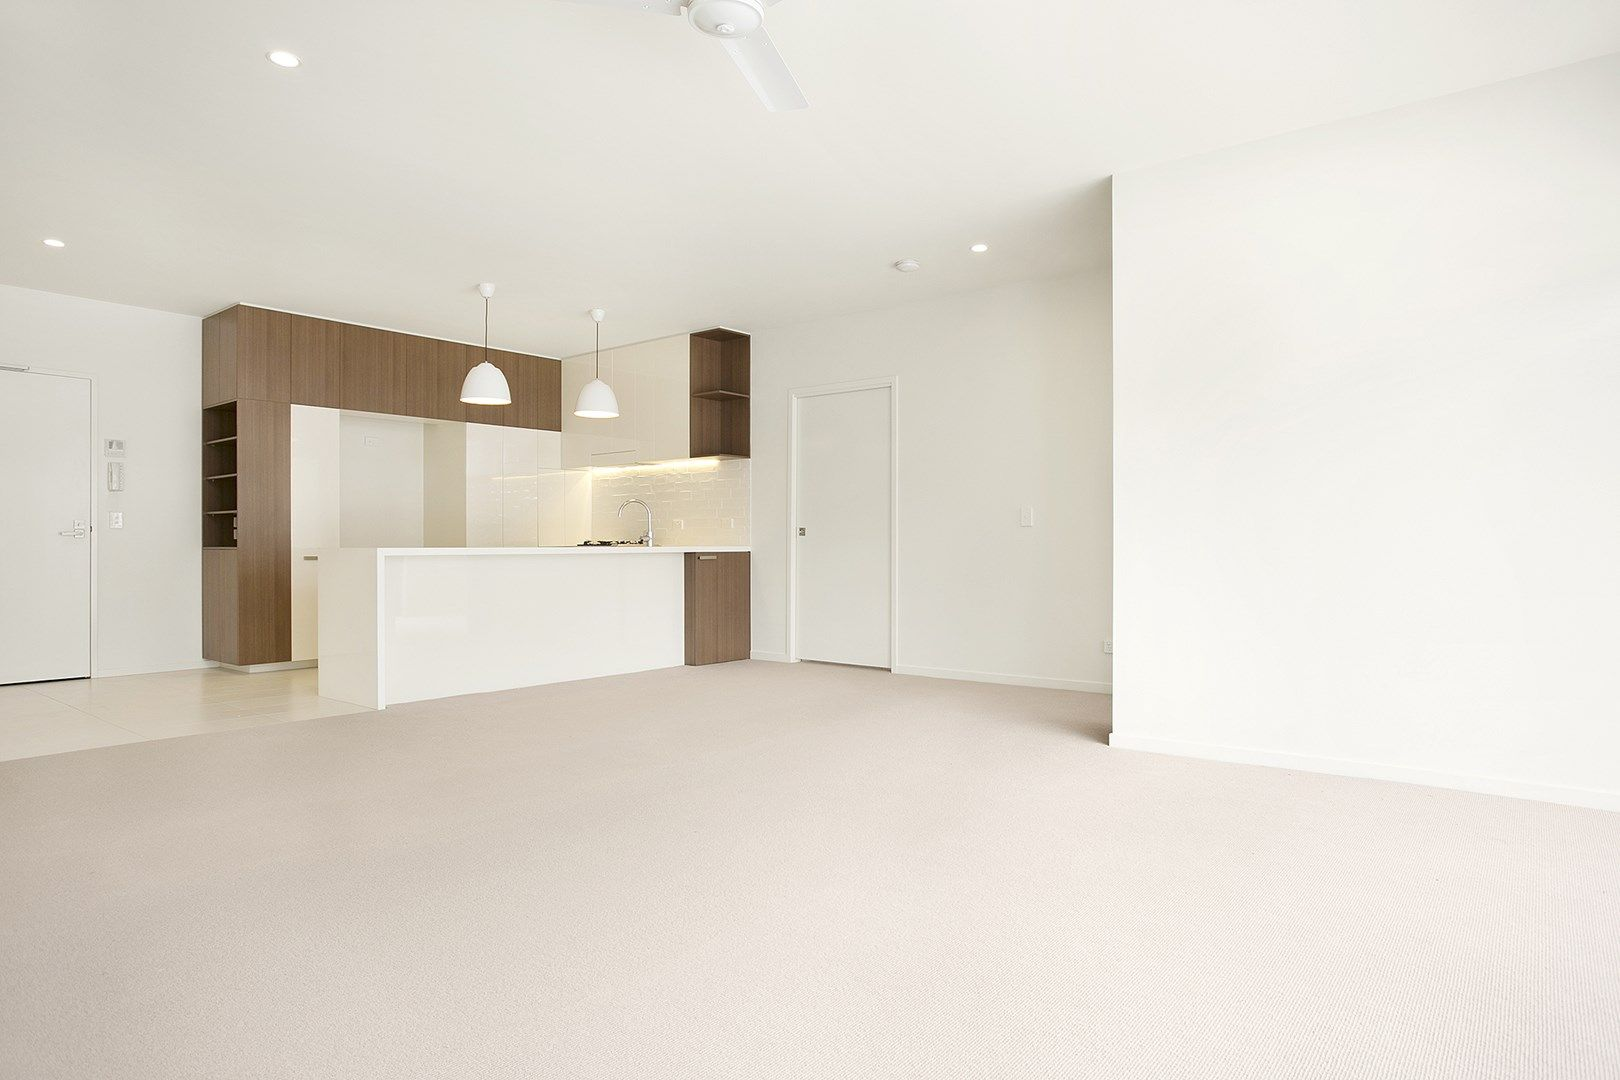 206/16 Aspinall Street, Nundah QLD 4012, Image 1